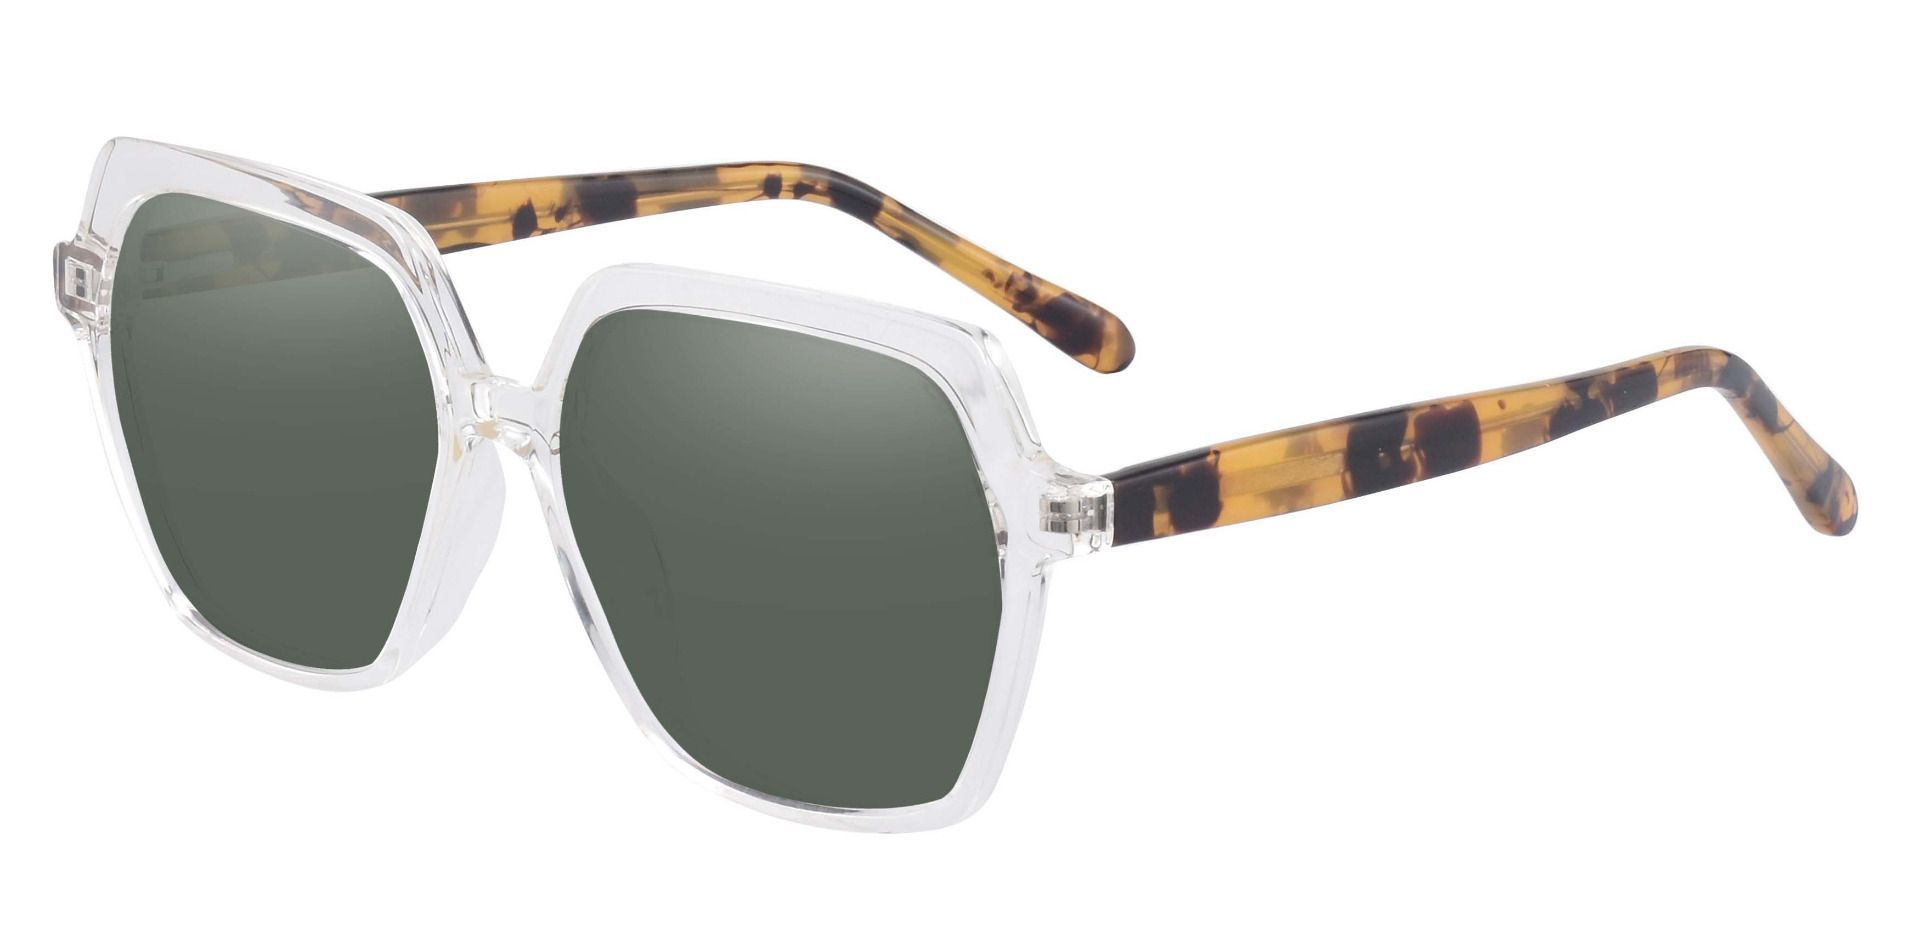 Regent Geometric Prescription Sunglasses - Clear Frame With Green Lenses